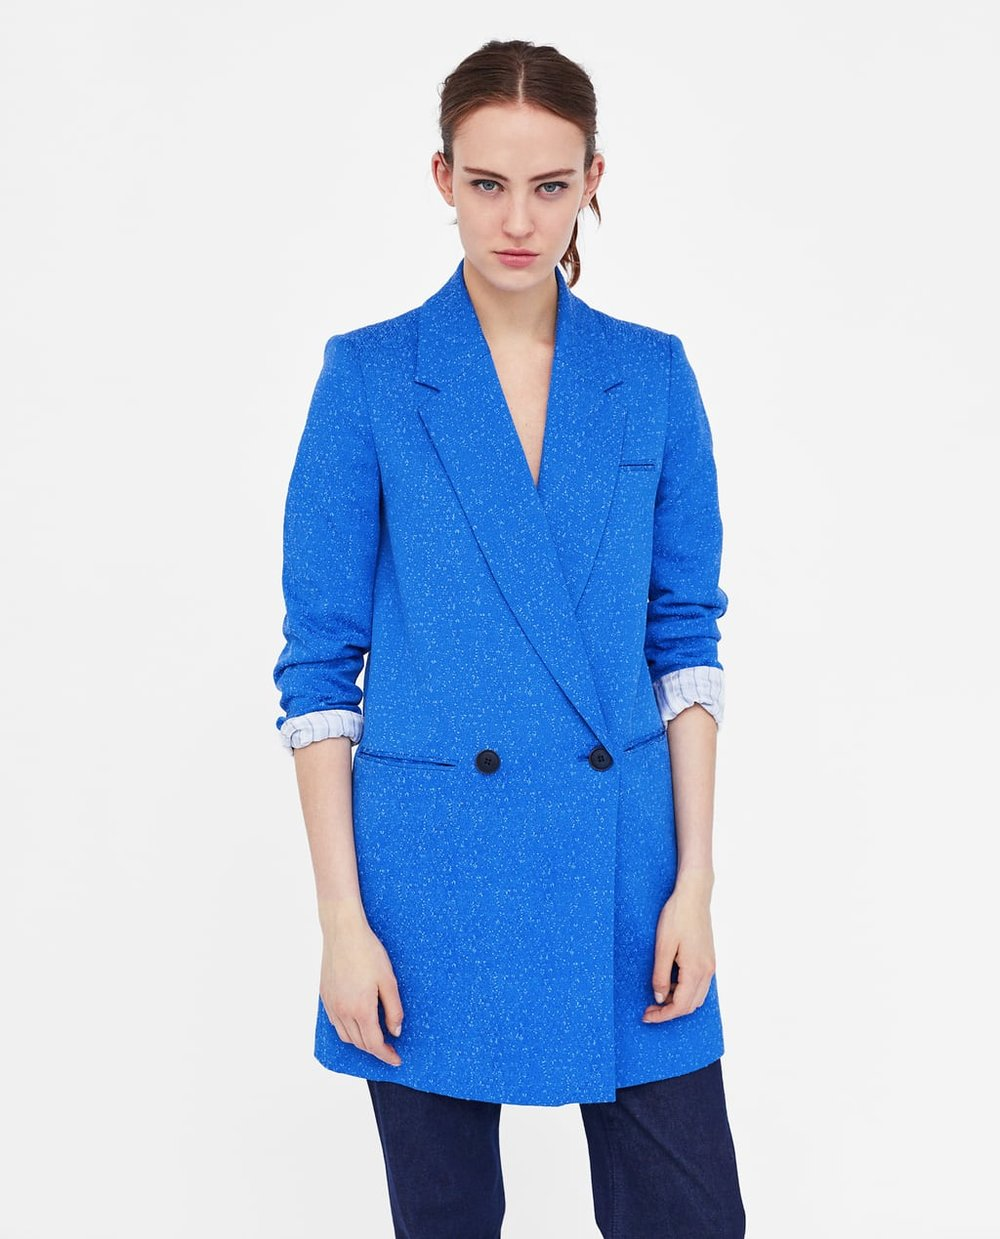 https://www.zara.com/ca/en/textured-weave-double-breasted-coat-p02851735.html?v1=6092192&v2=968852